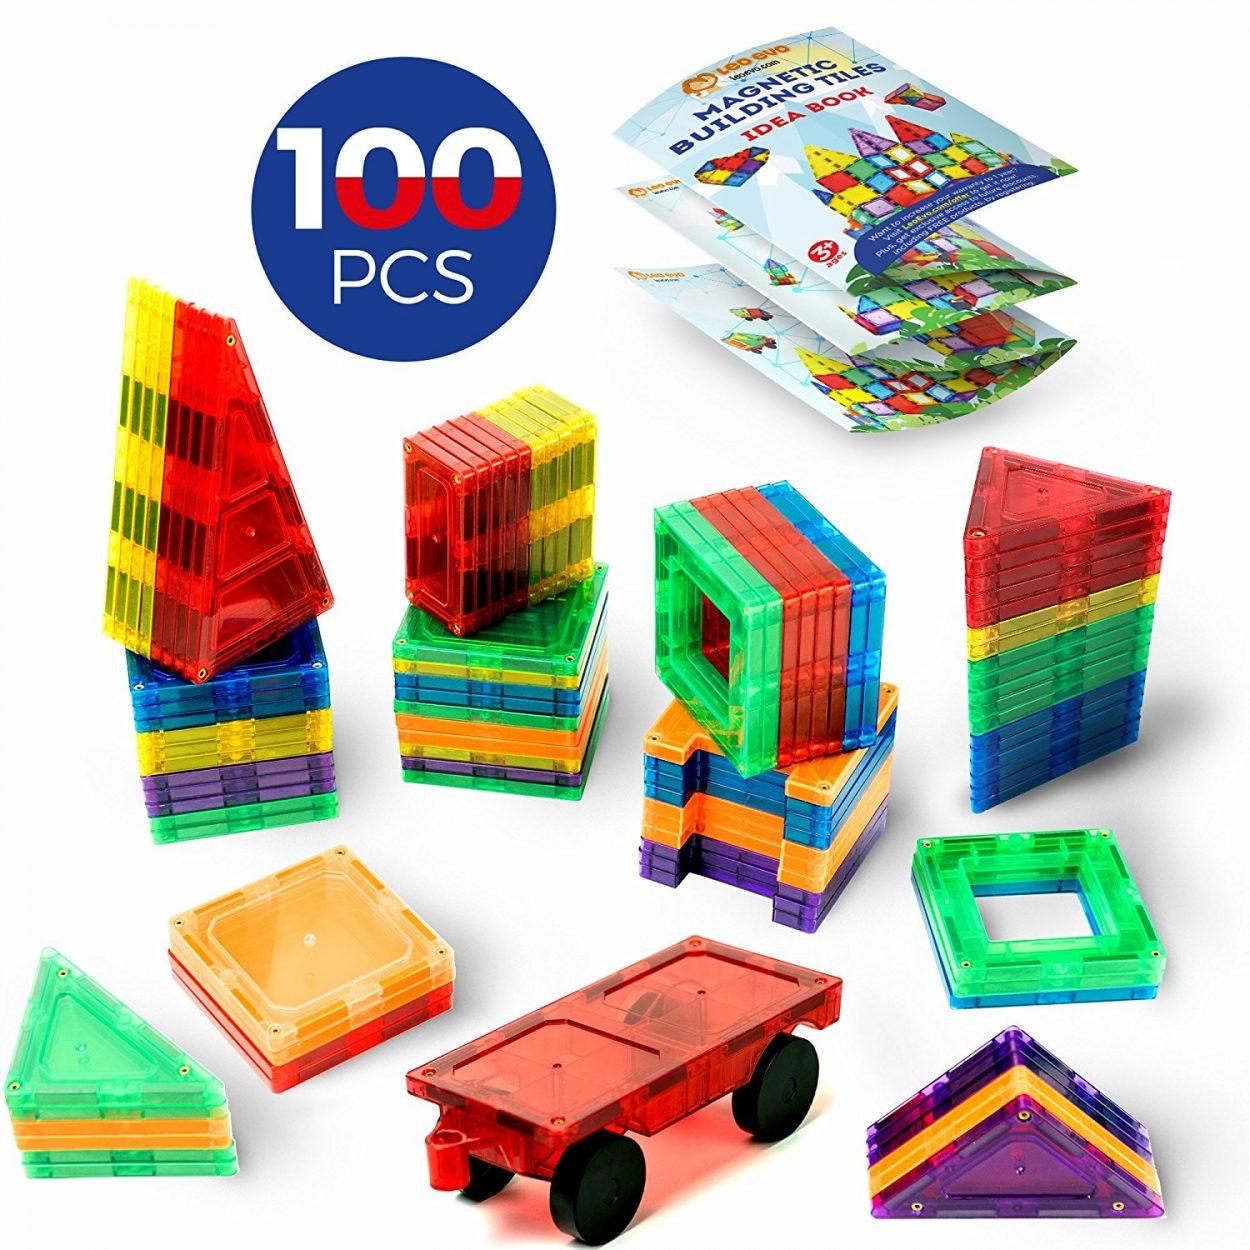 Magnetic Building Tiles for Kids